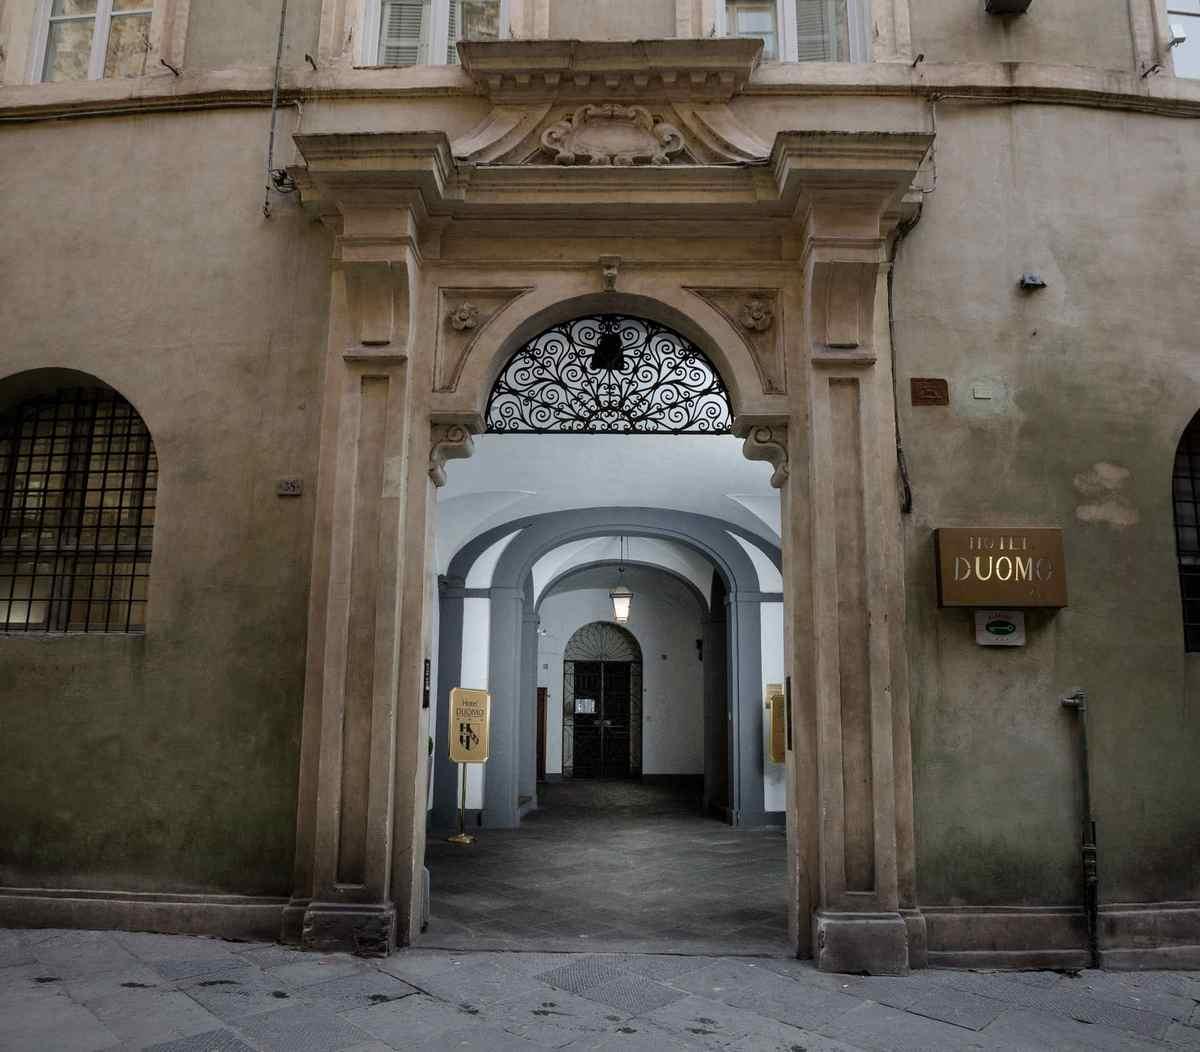 Hotel Duomo Hotel A Siena